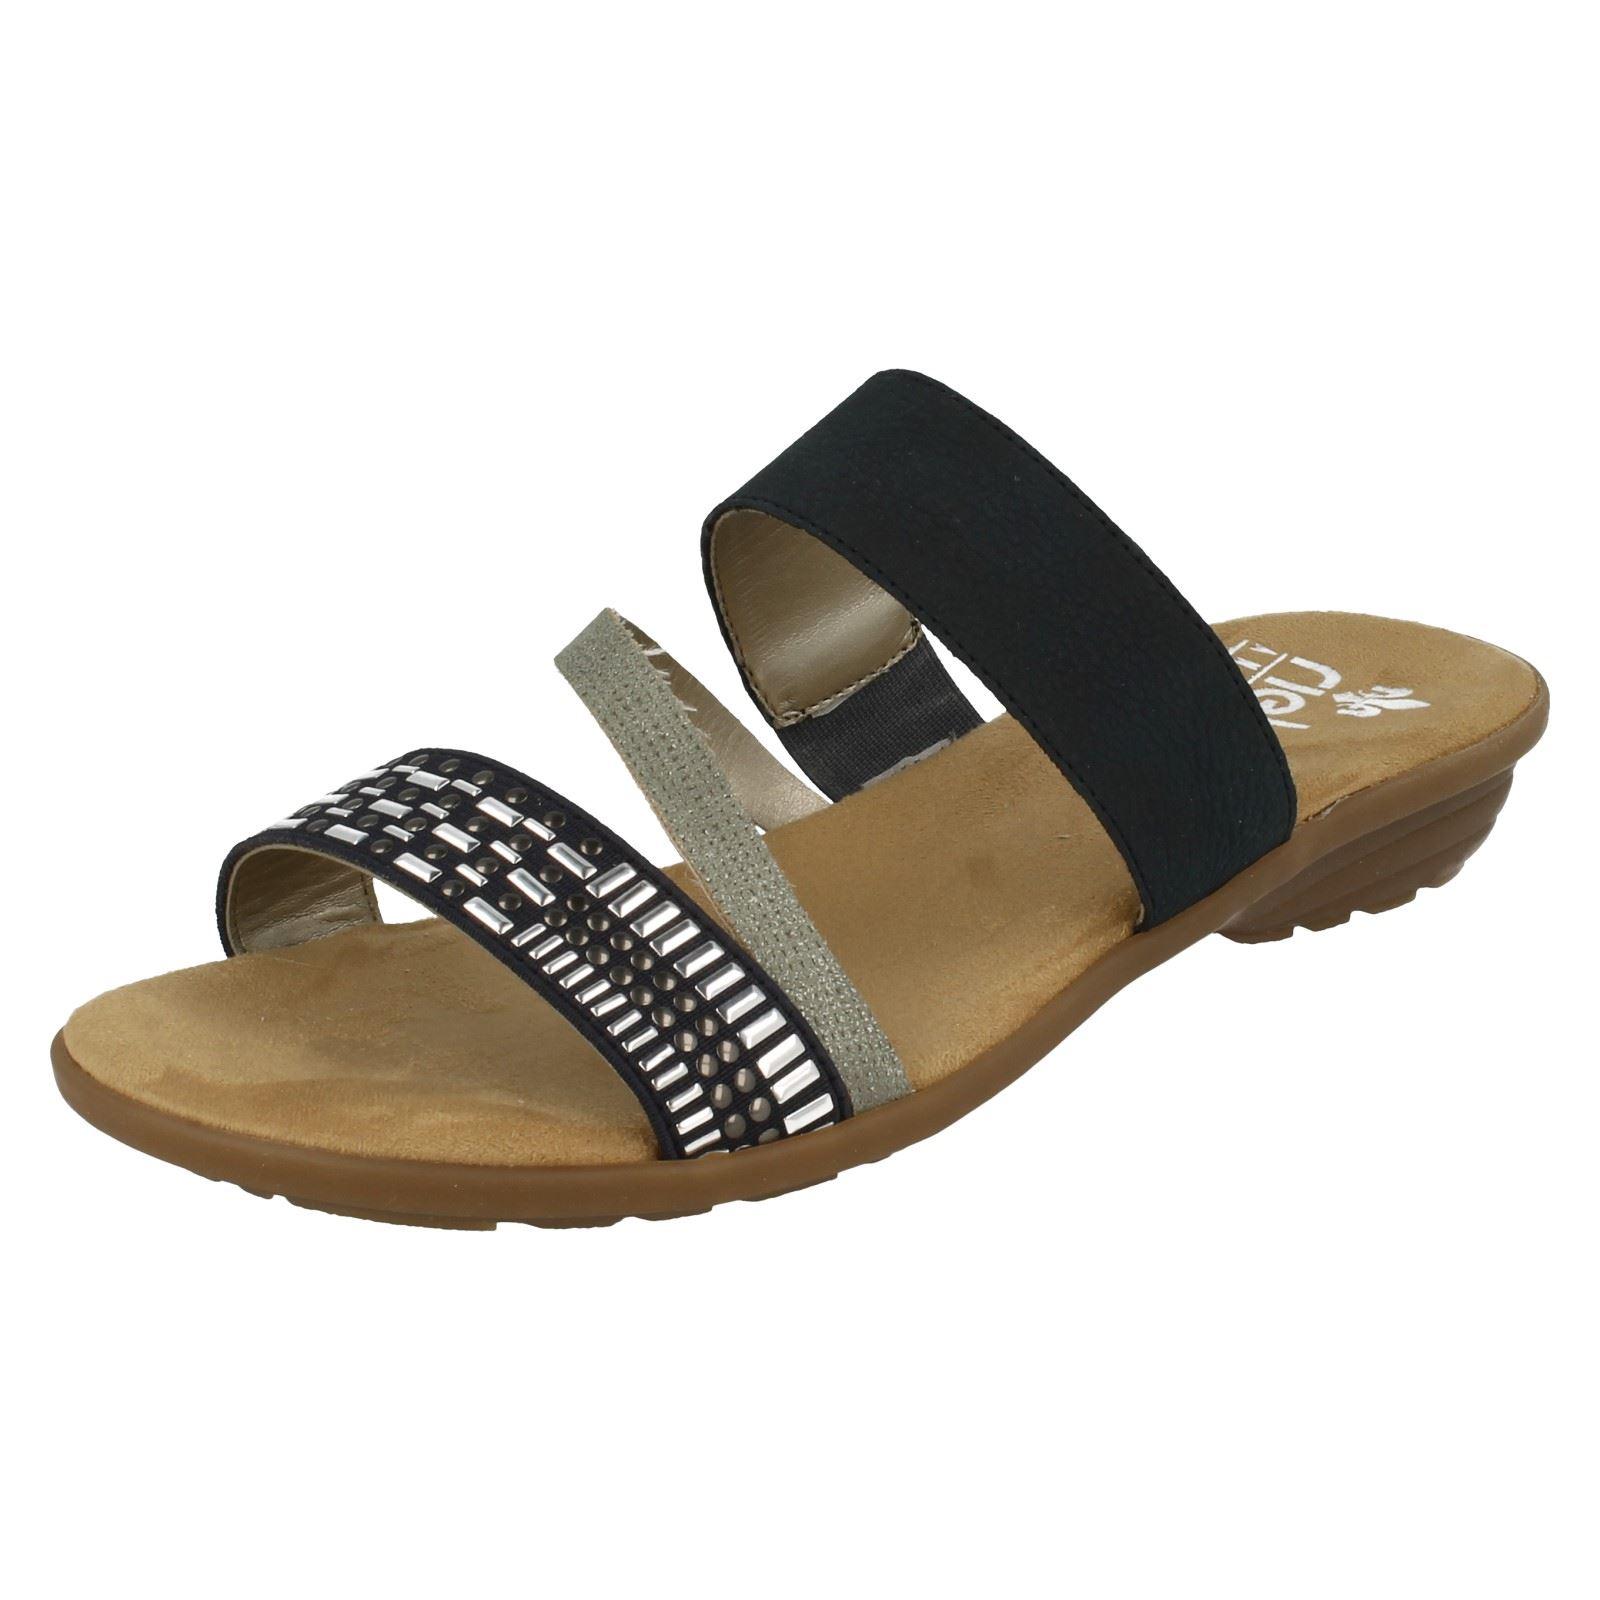 Damas Damas Damas Rieker Sandalias Planas De Moda-V3454  Felices compras